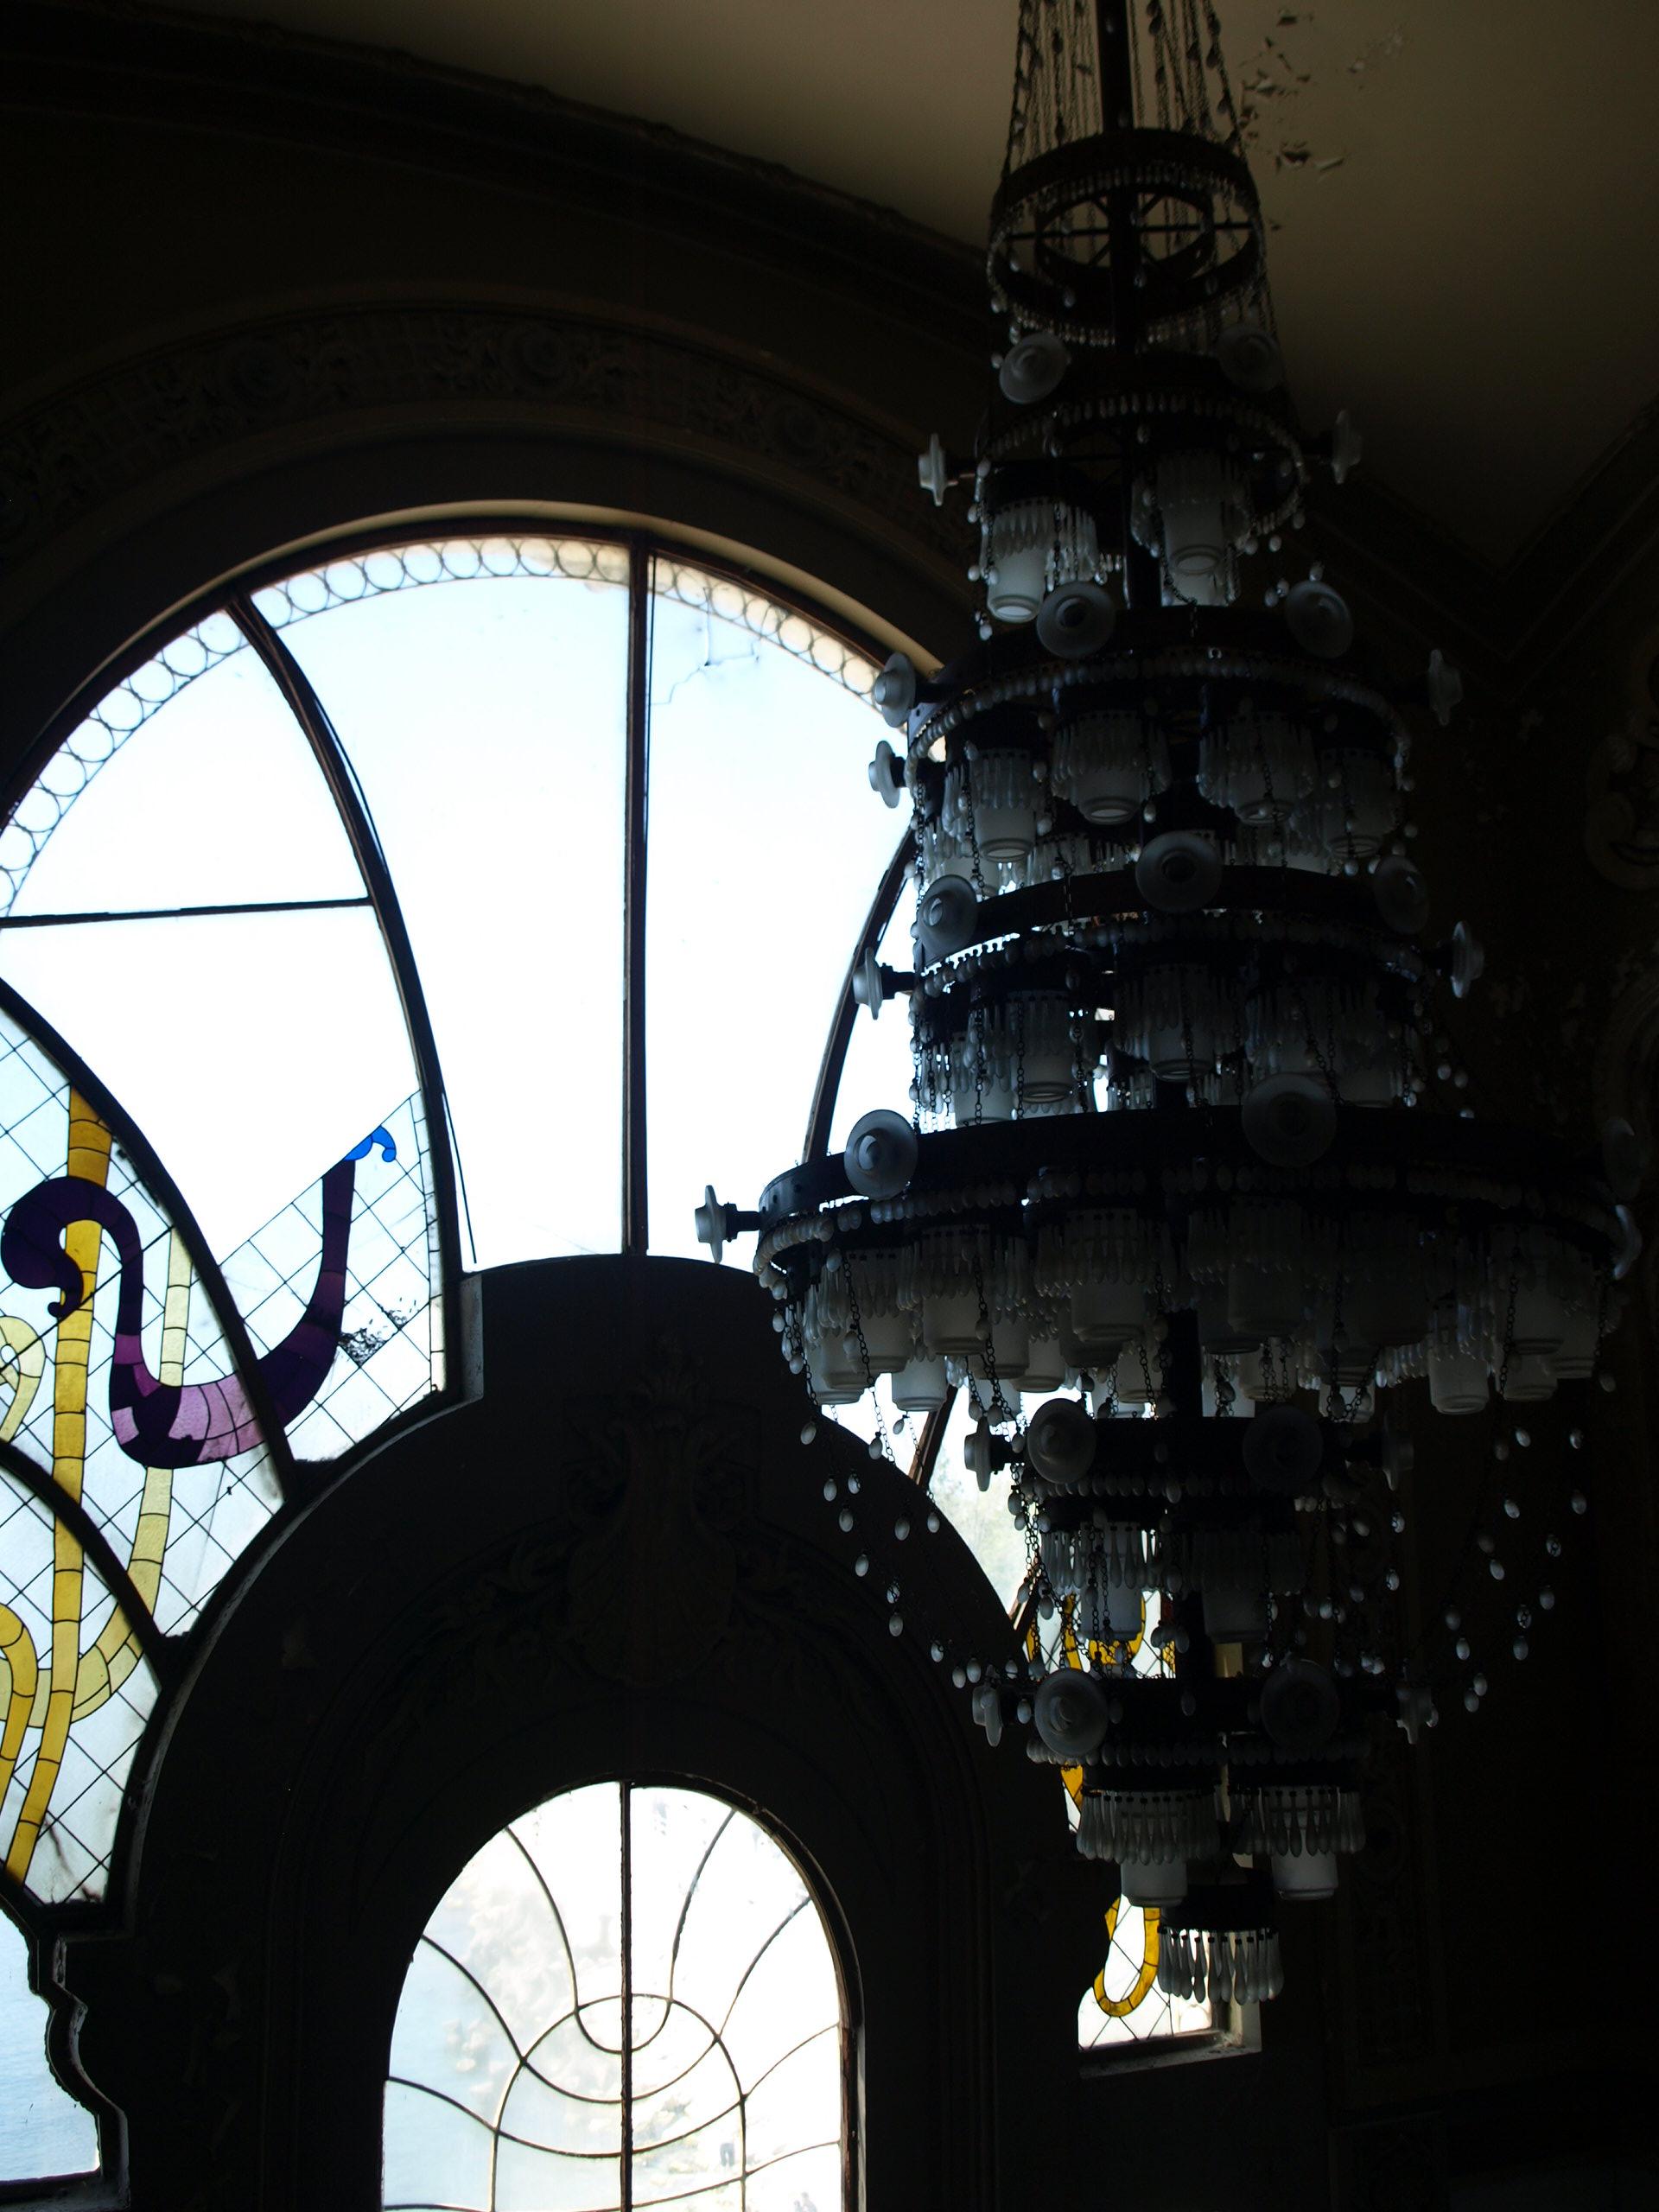 Constanta - wnętrze kasyna